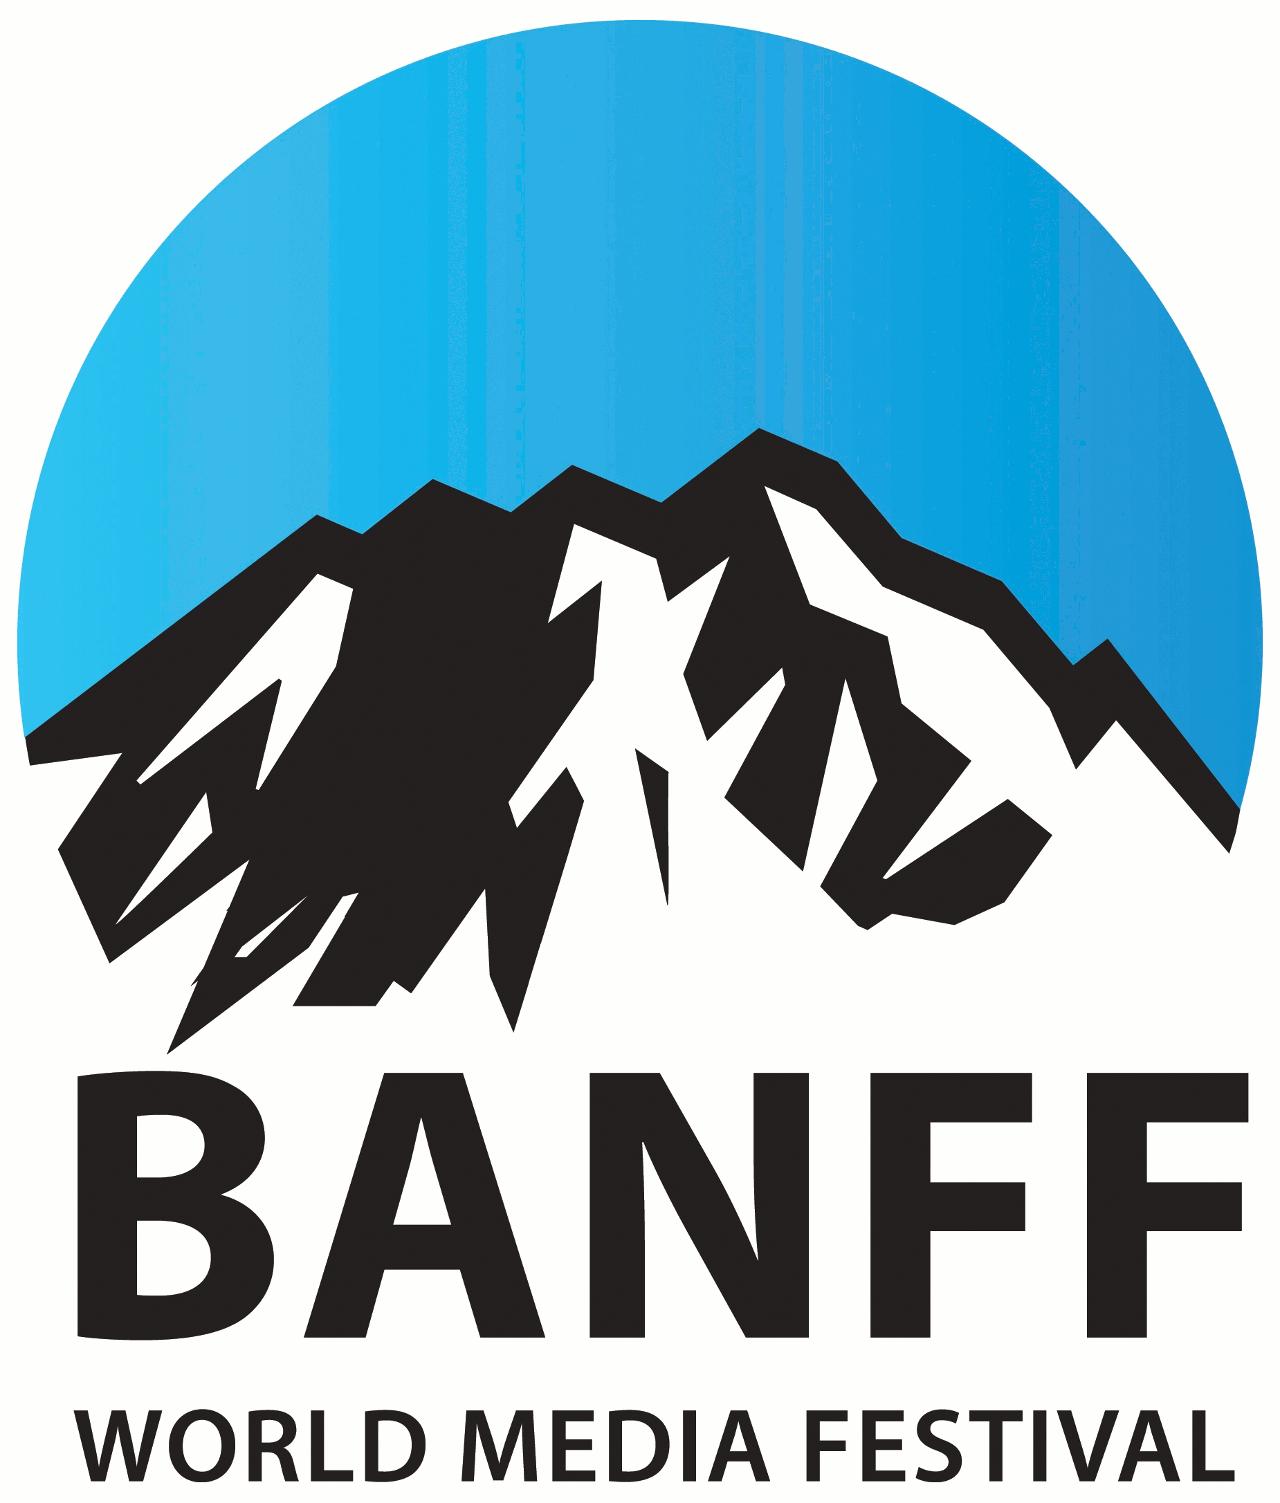 BANFF logo.